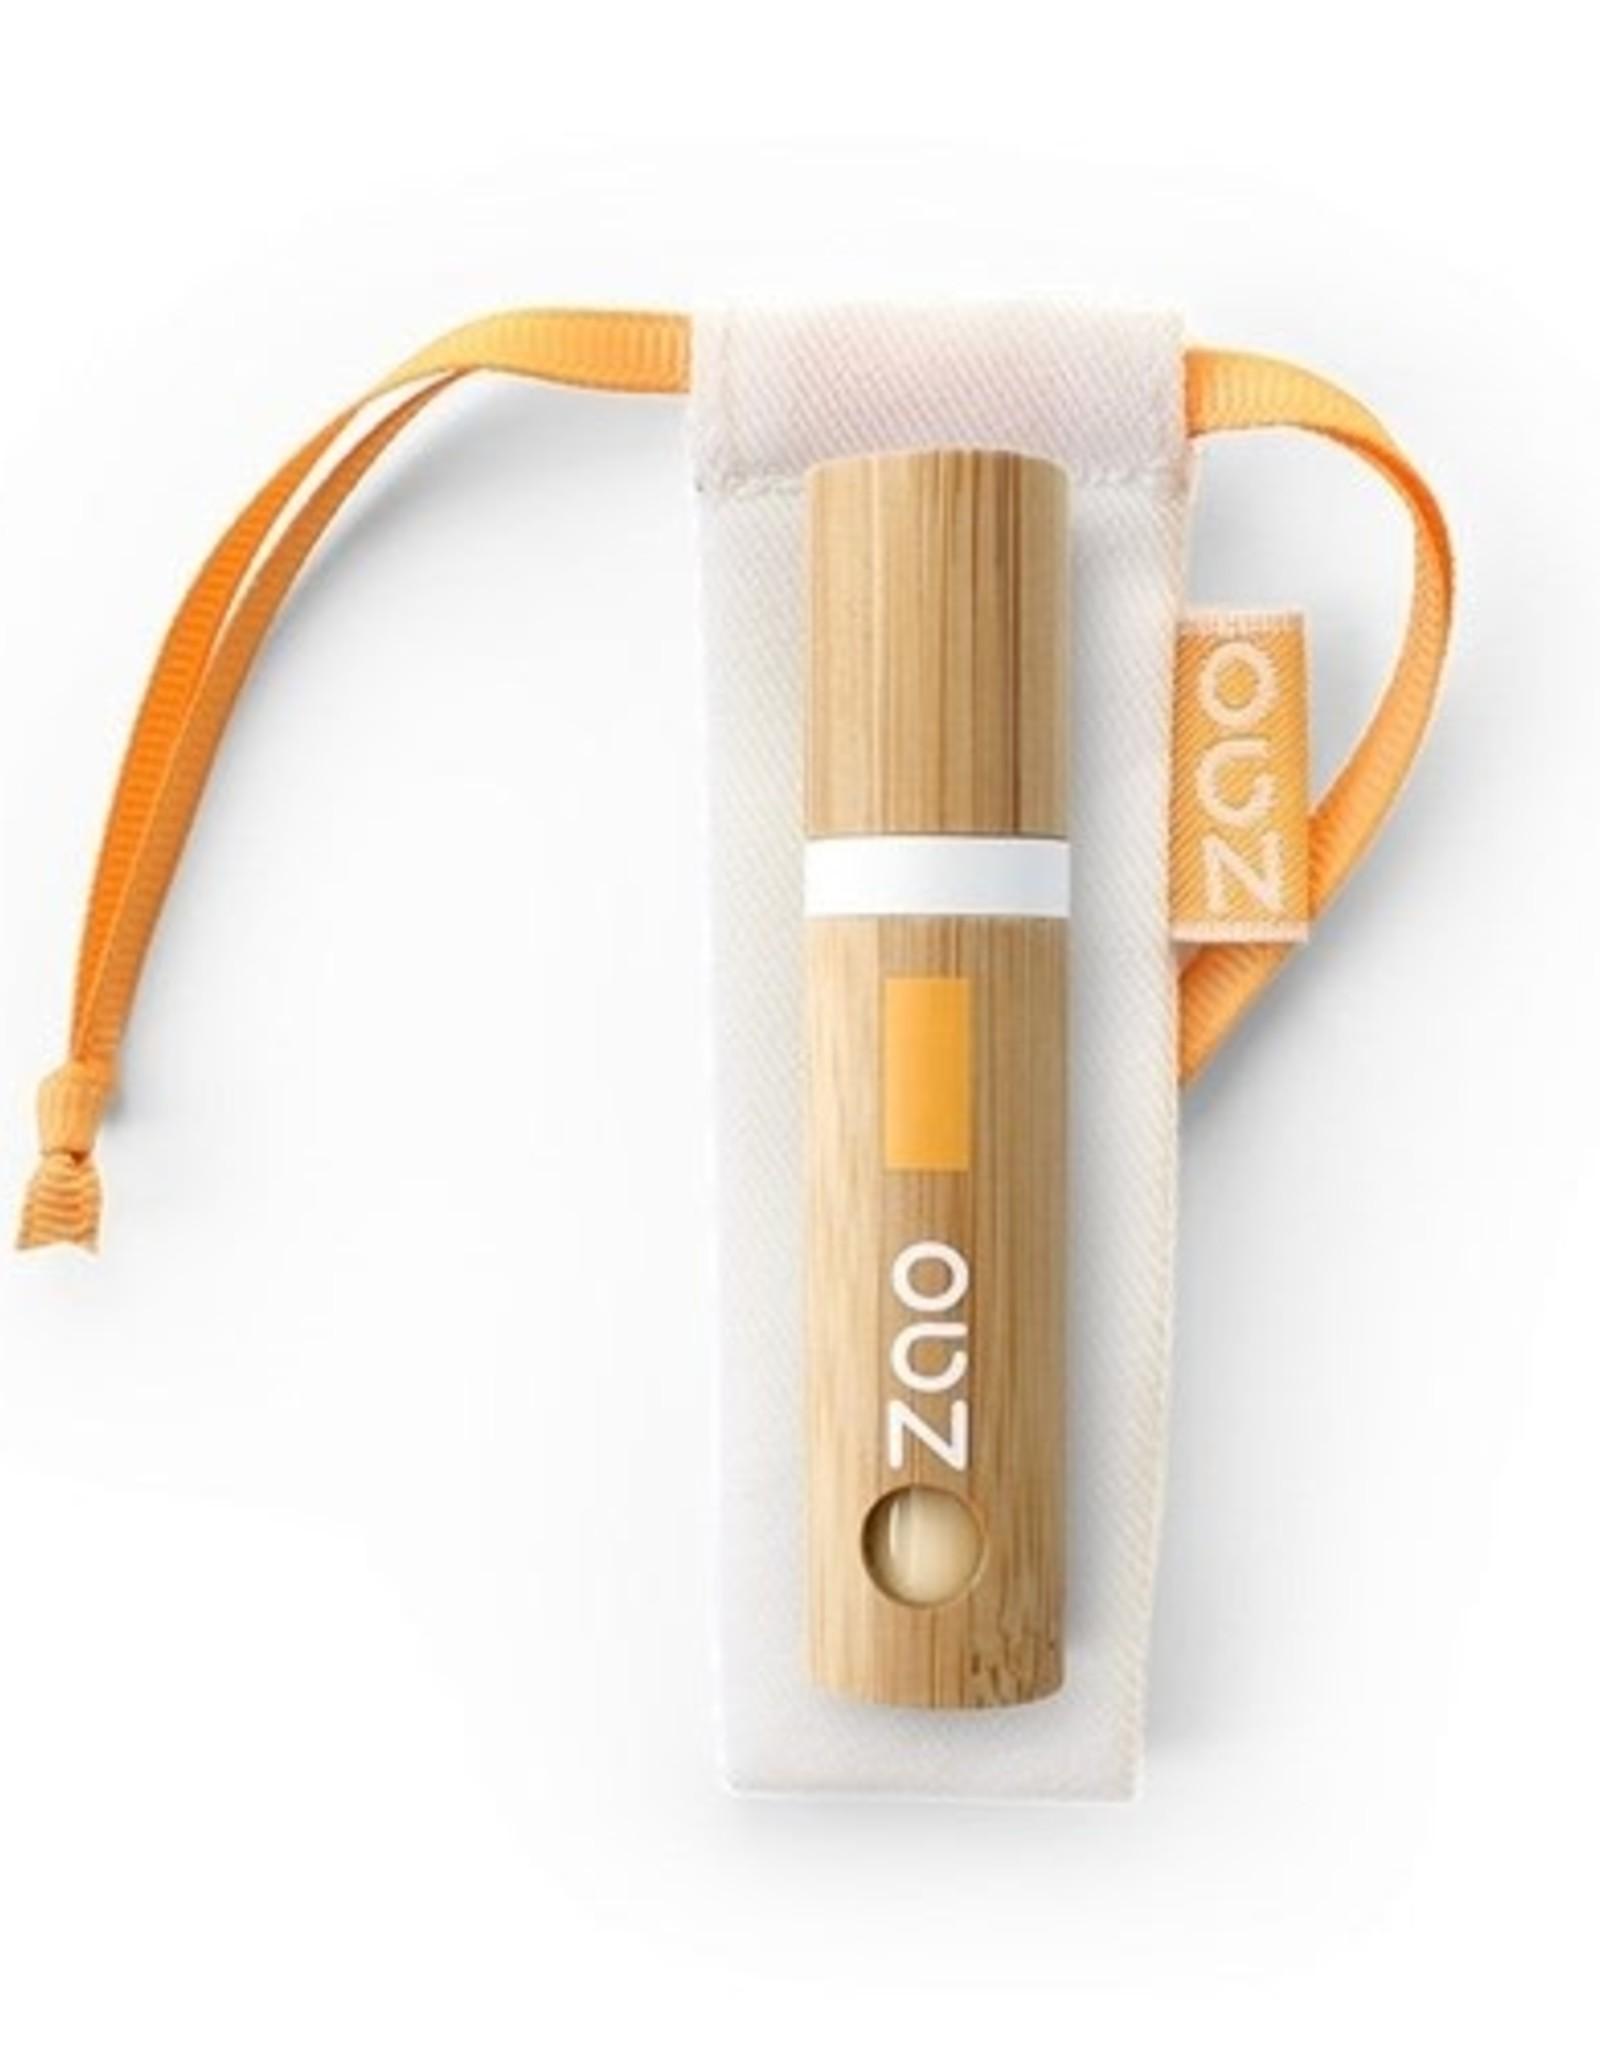 Zao ZAO Bamboe Vloeibare Primer voor de ogen 258 4 Gram